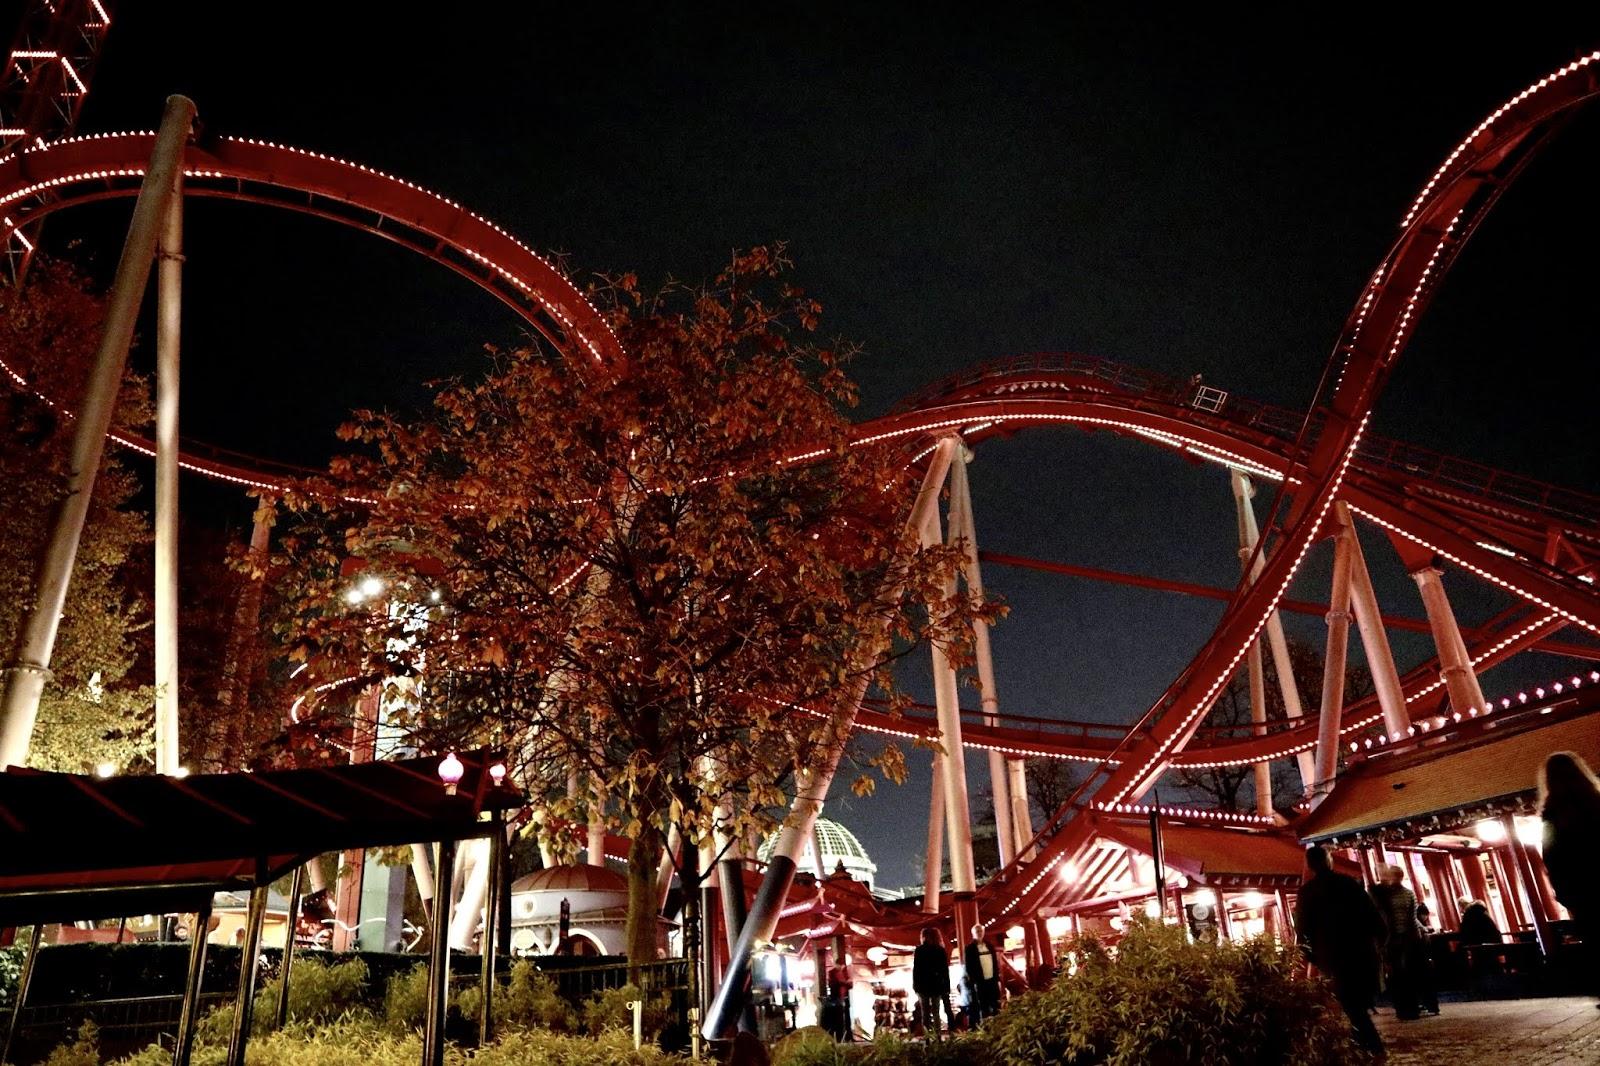 rollercoasters in Copenhagen